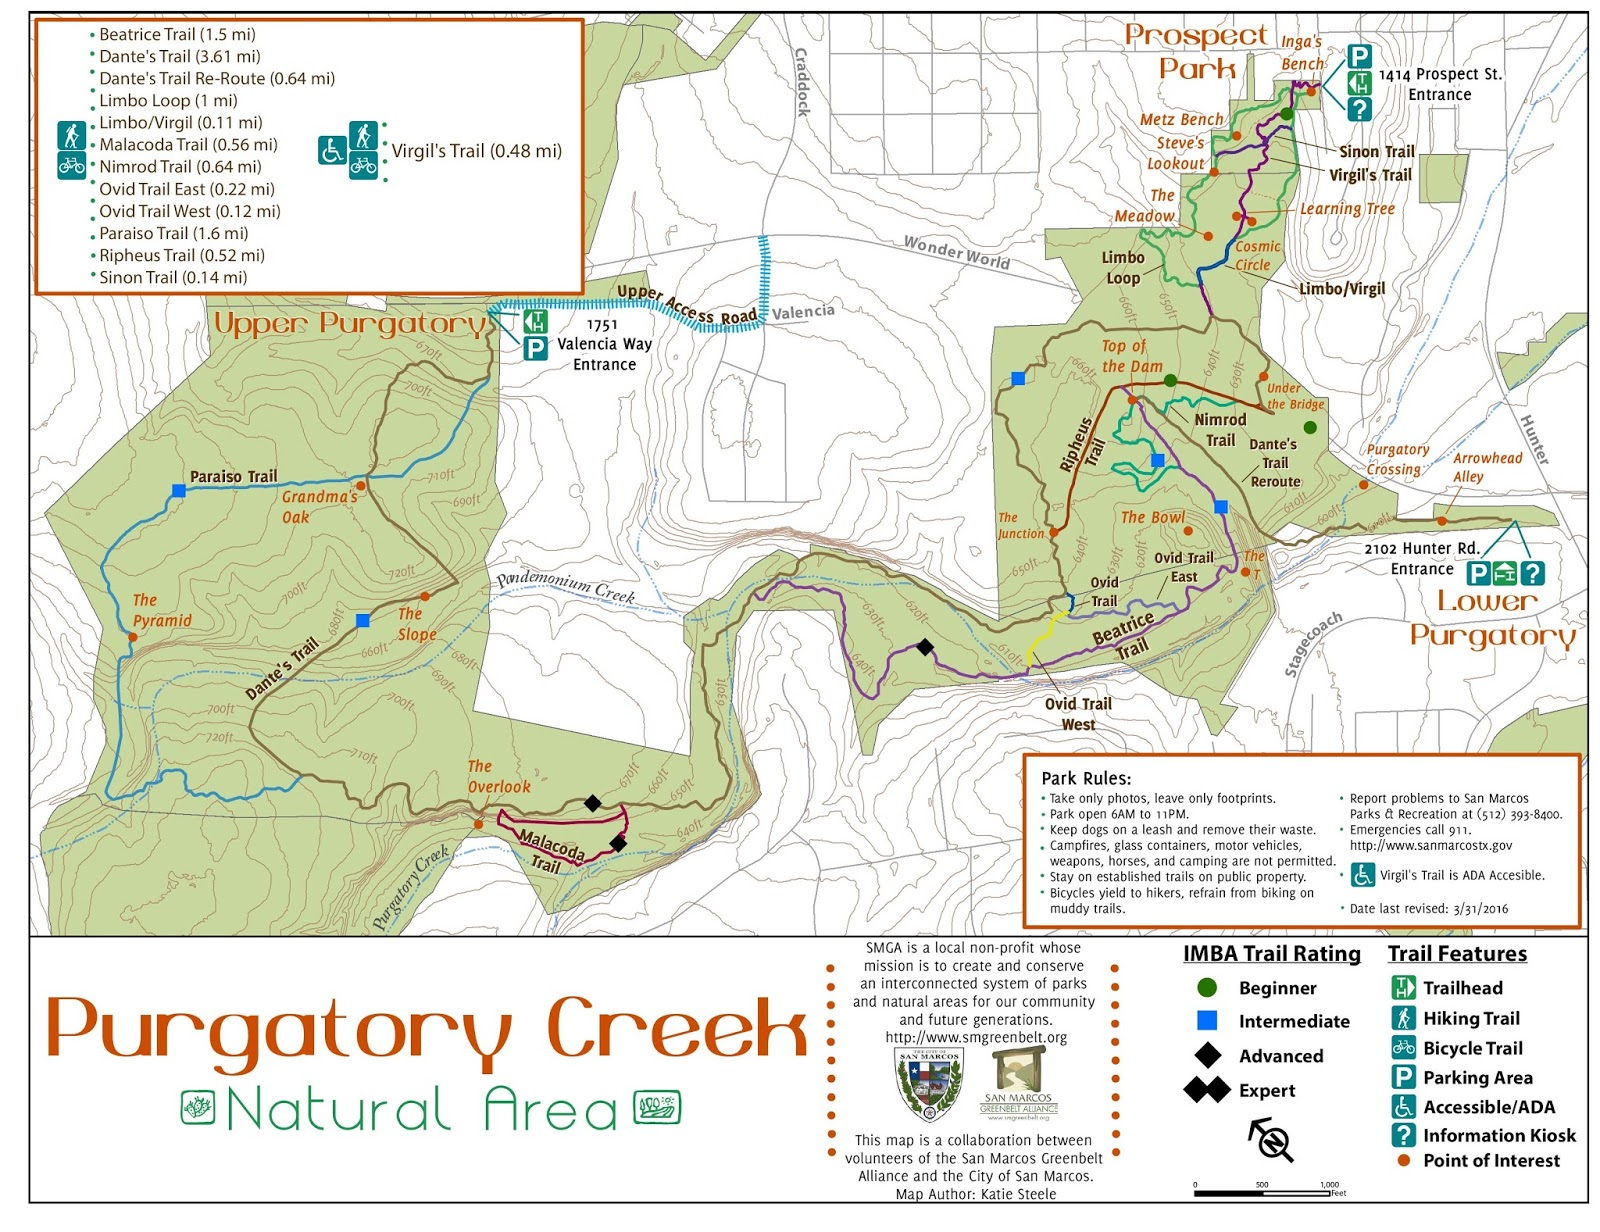 Temporary Purgatory Map | San Marcos Greenbelt Alliance on